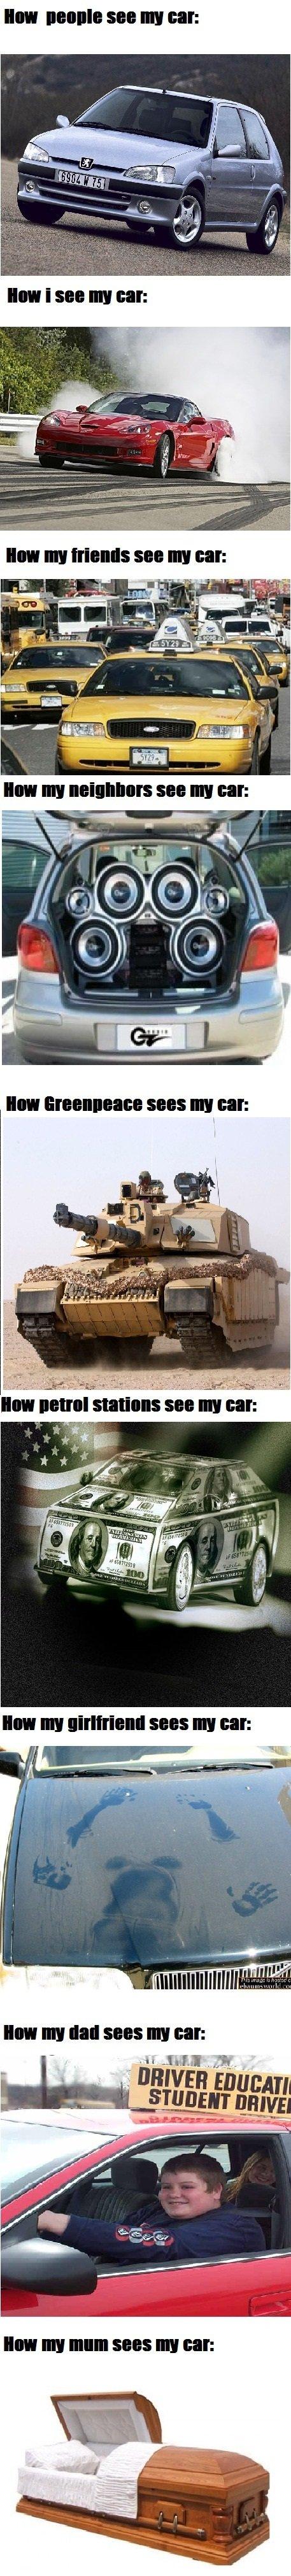 my car. thumbs up or down but don't skip please. HUI. III HID 5885 III Ell:. How i see my car car my car neighbor Mom dad friend girlfriend